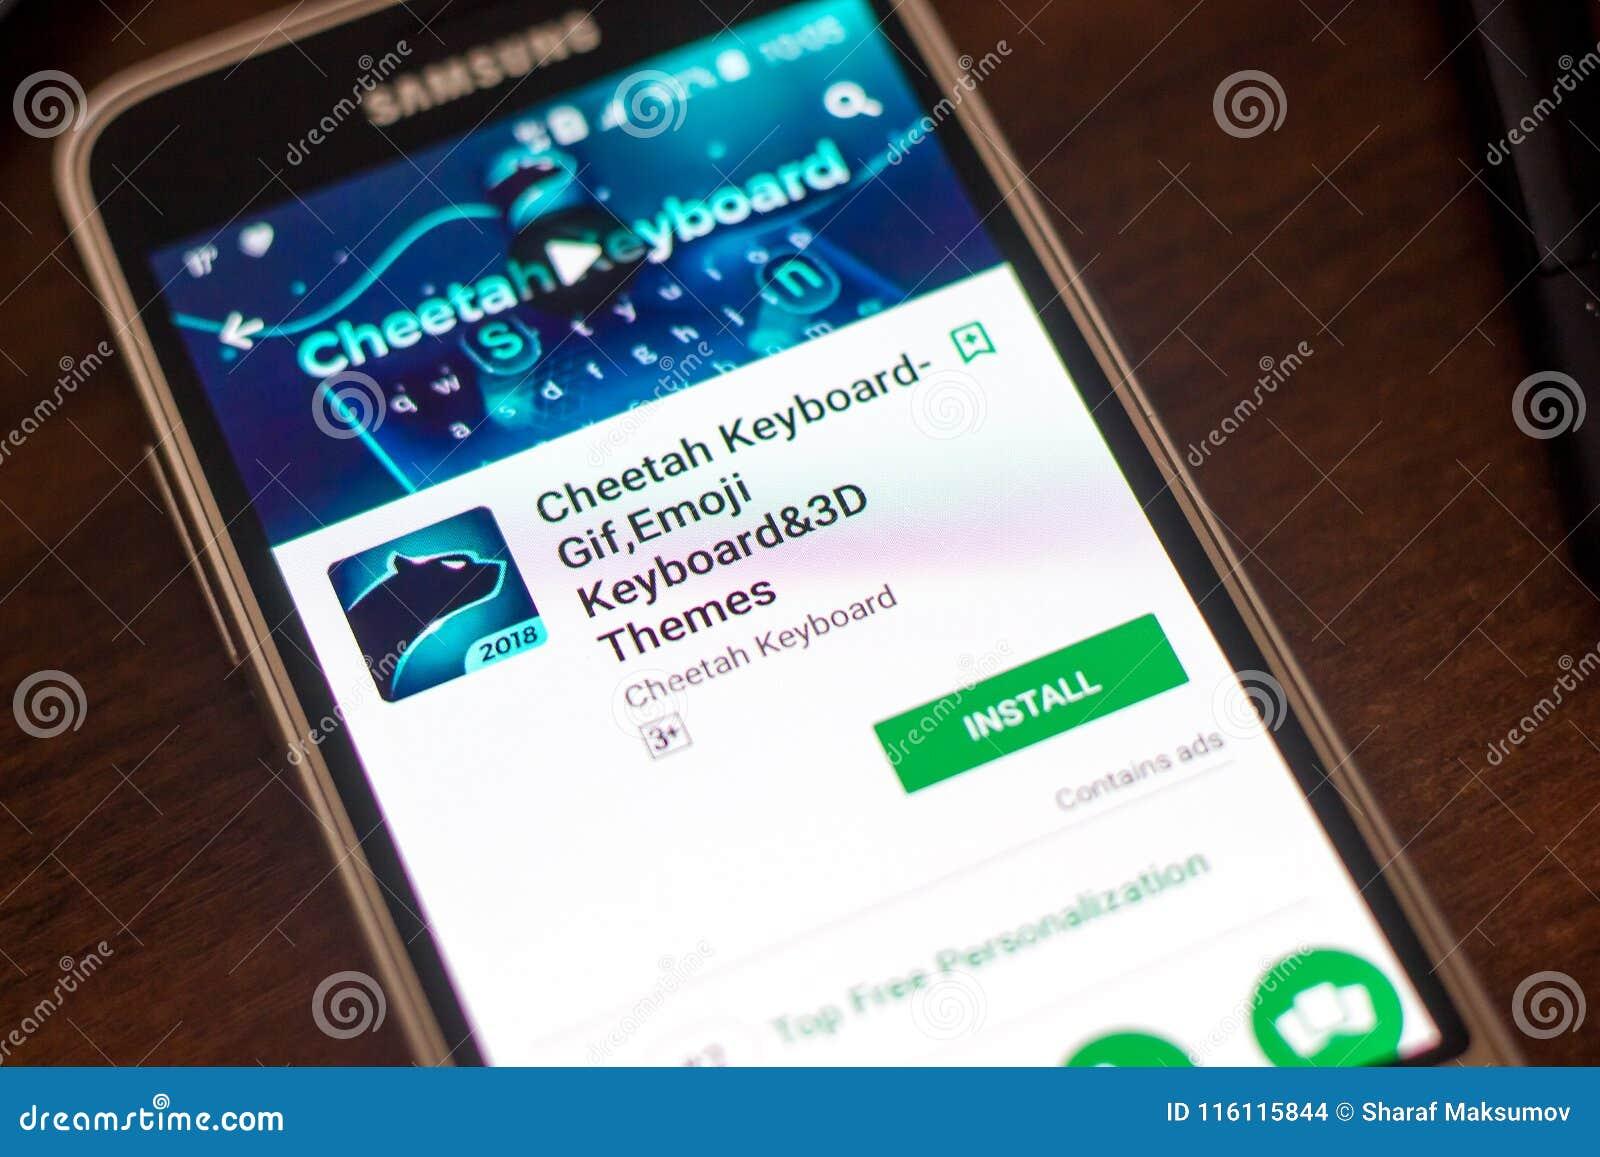 Ryazan, Russia - May 04, 2018: Cheetah Keyboard Mobile App